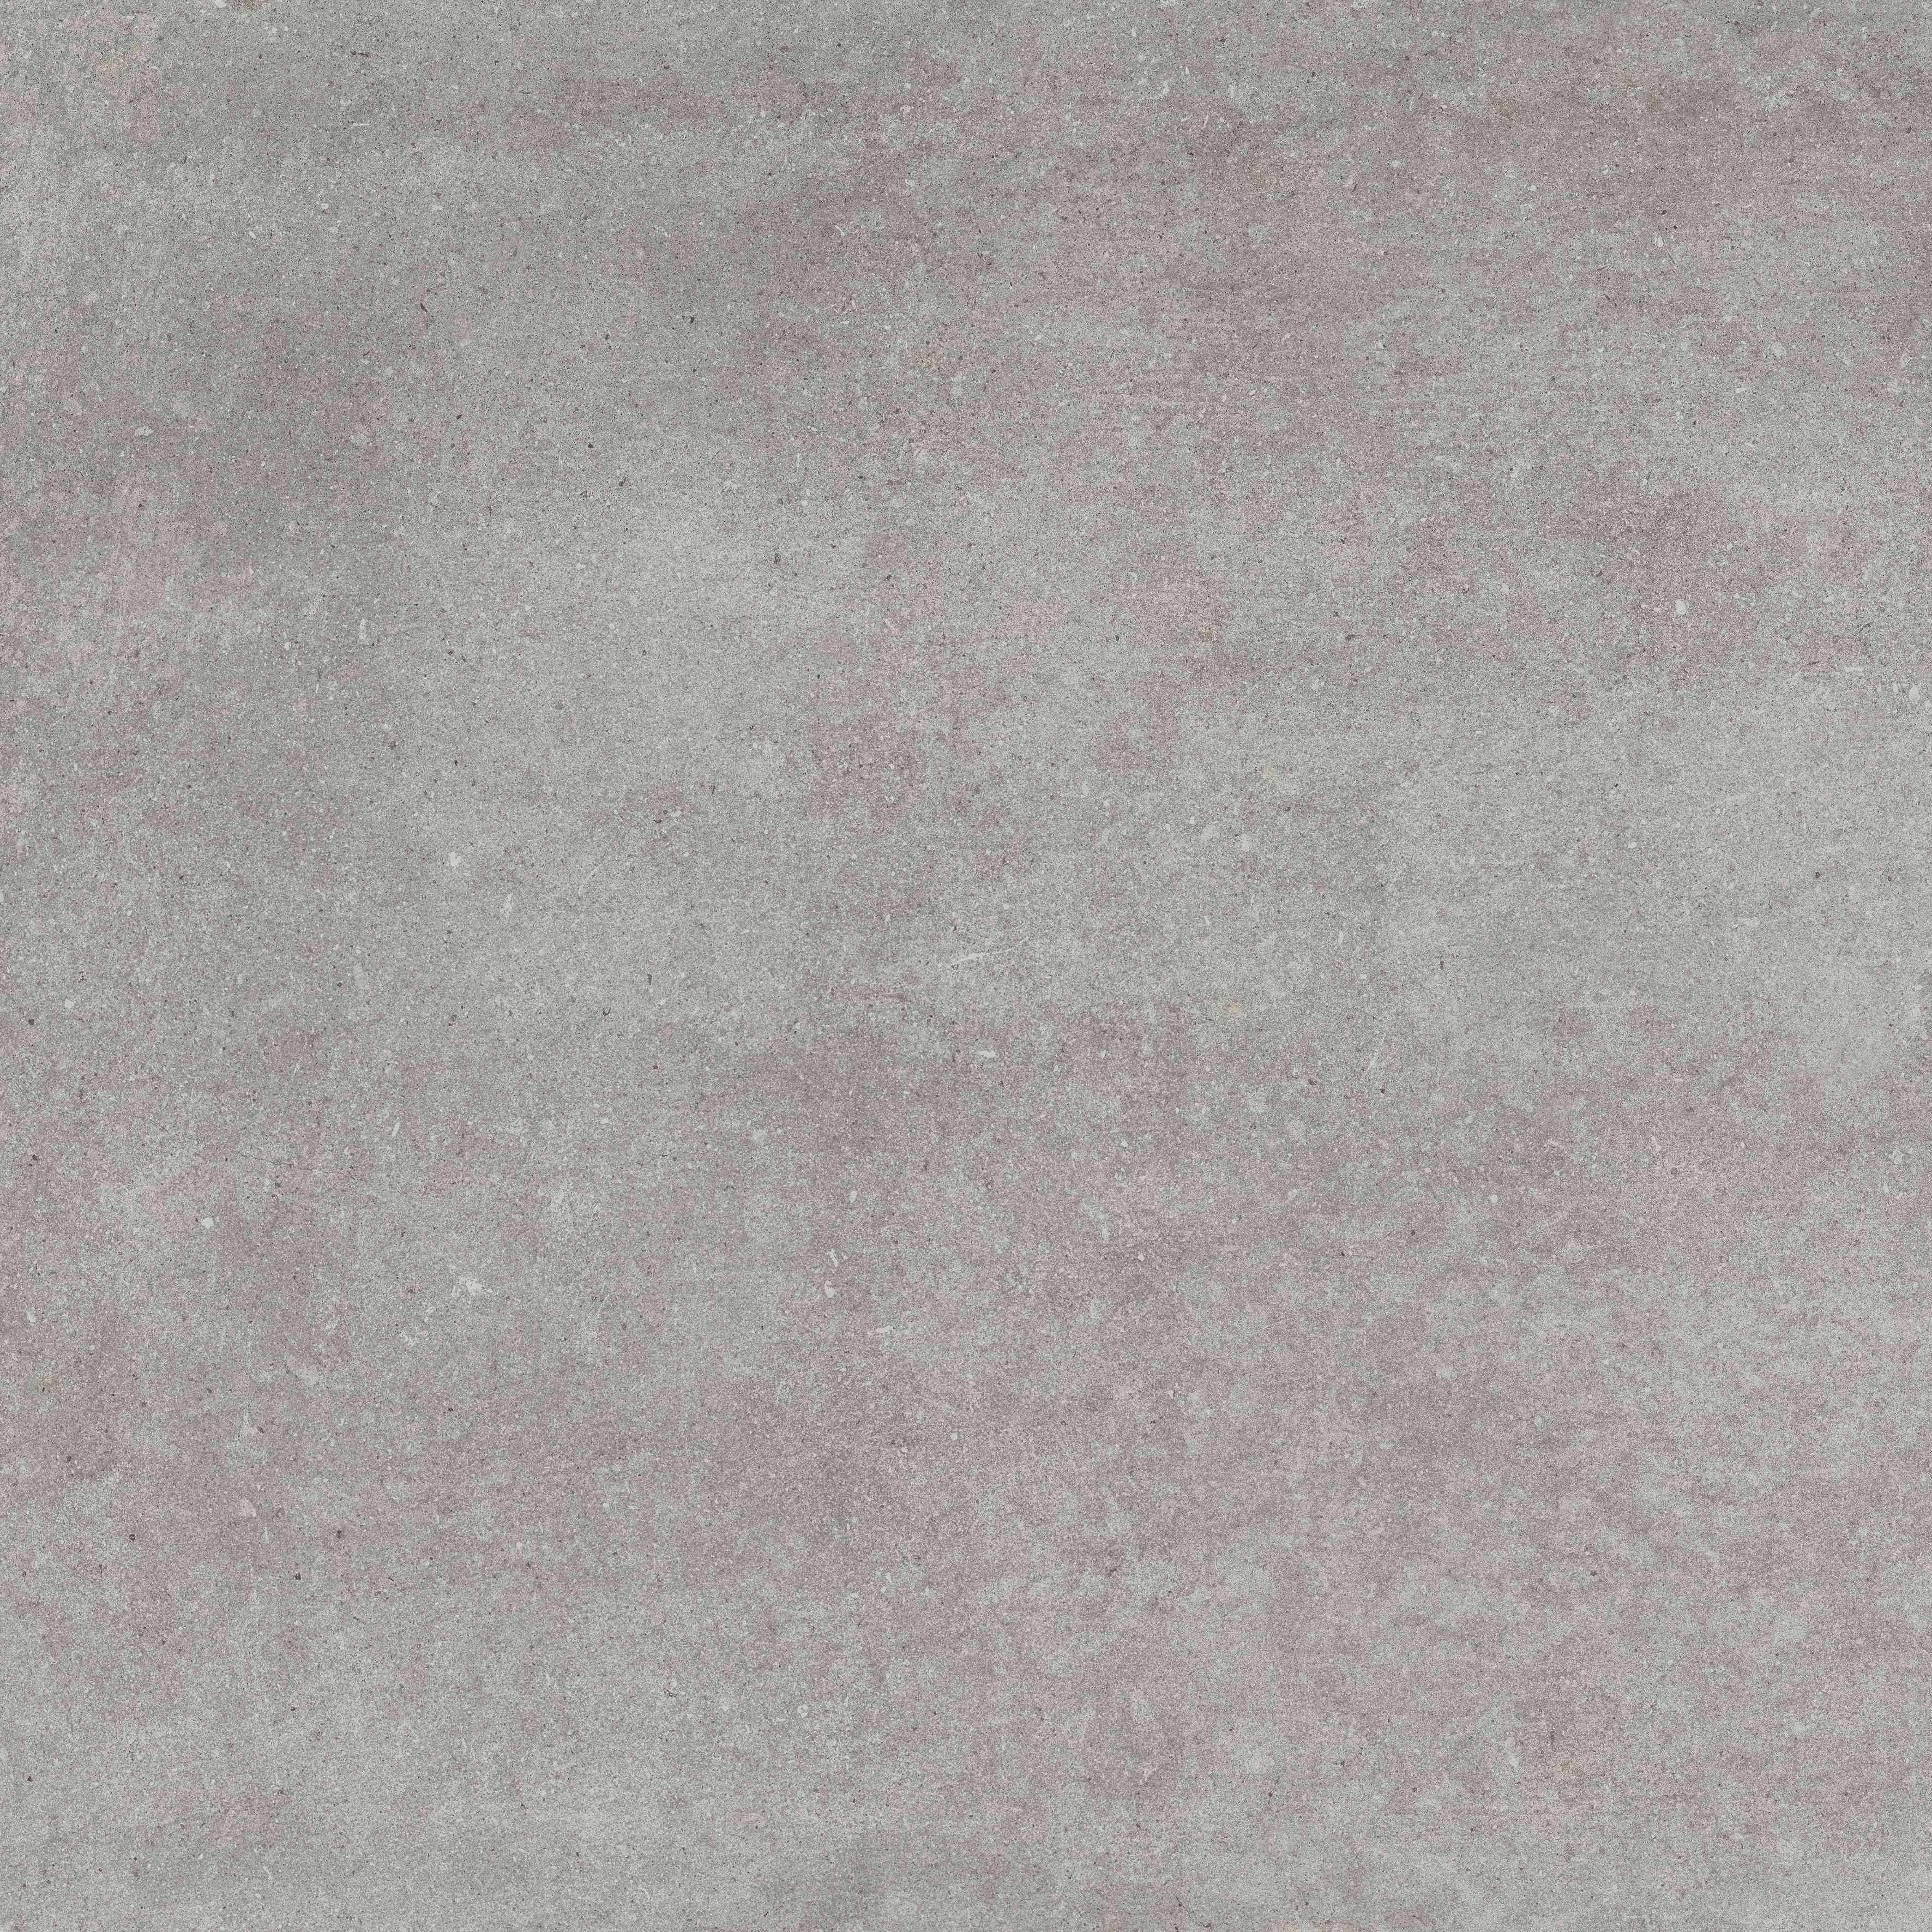 Плитка GRIGIO (ZRXRM8R) изображение 7